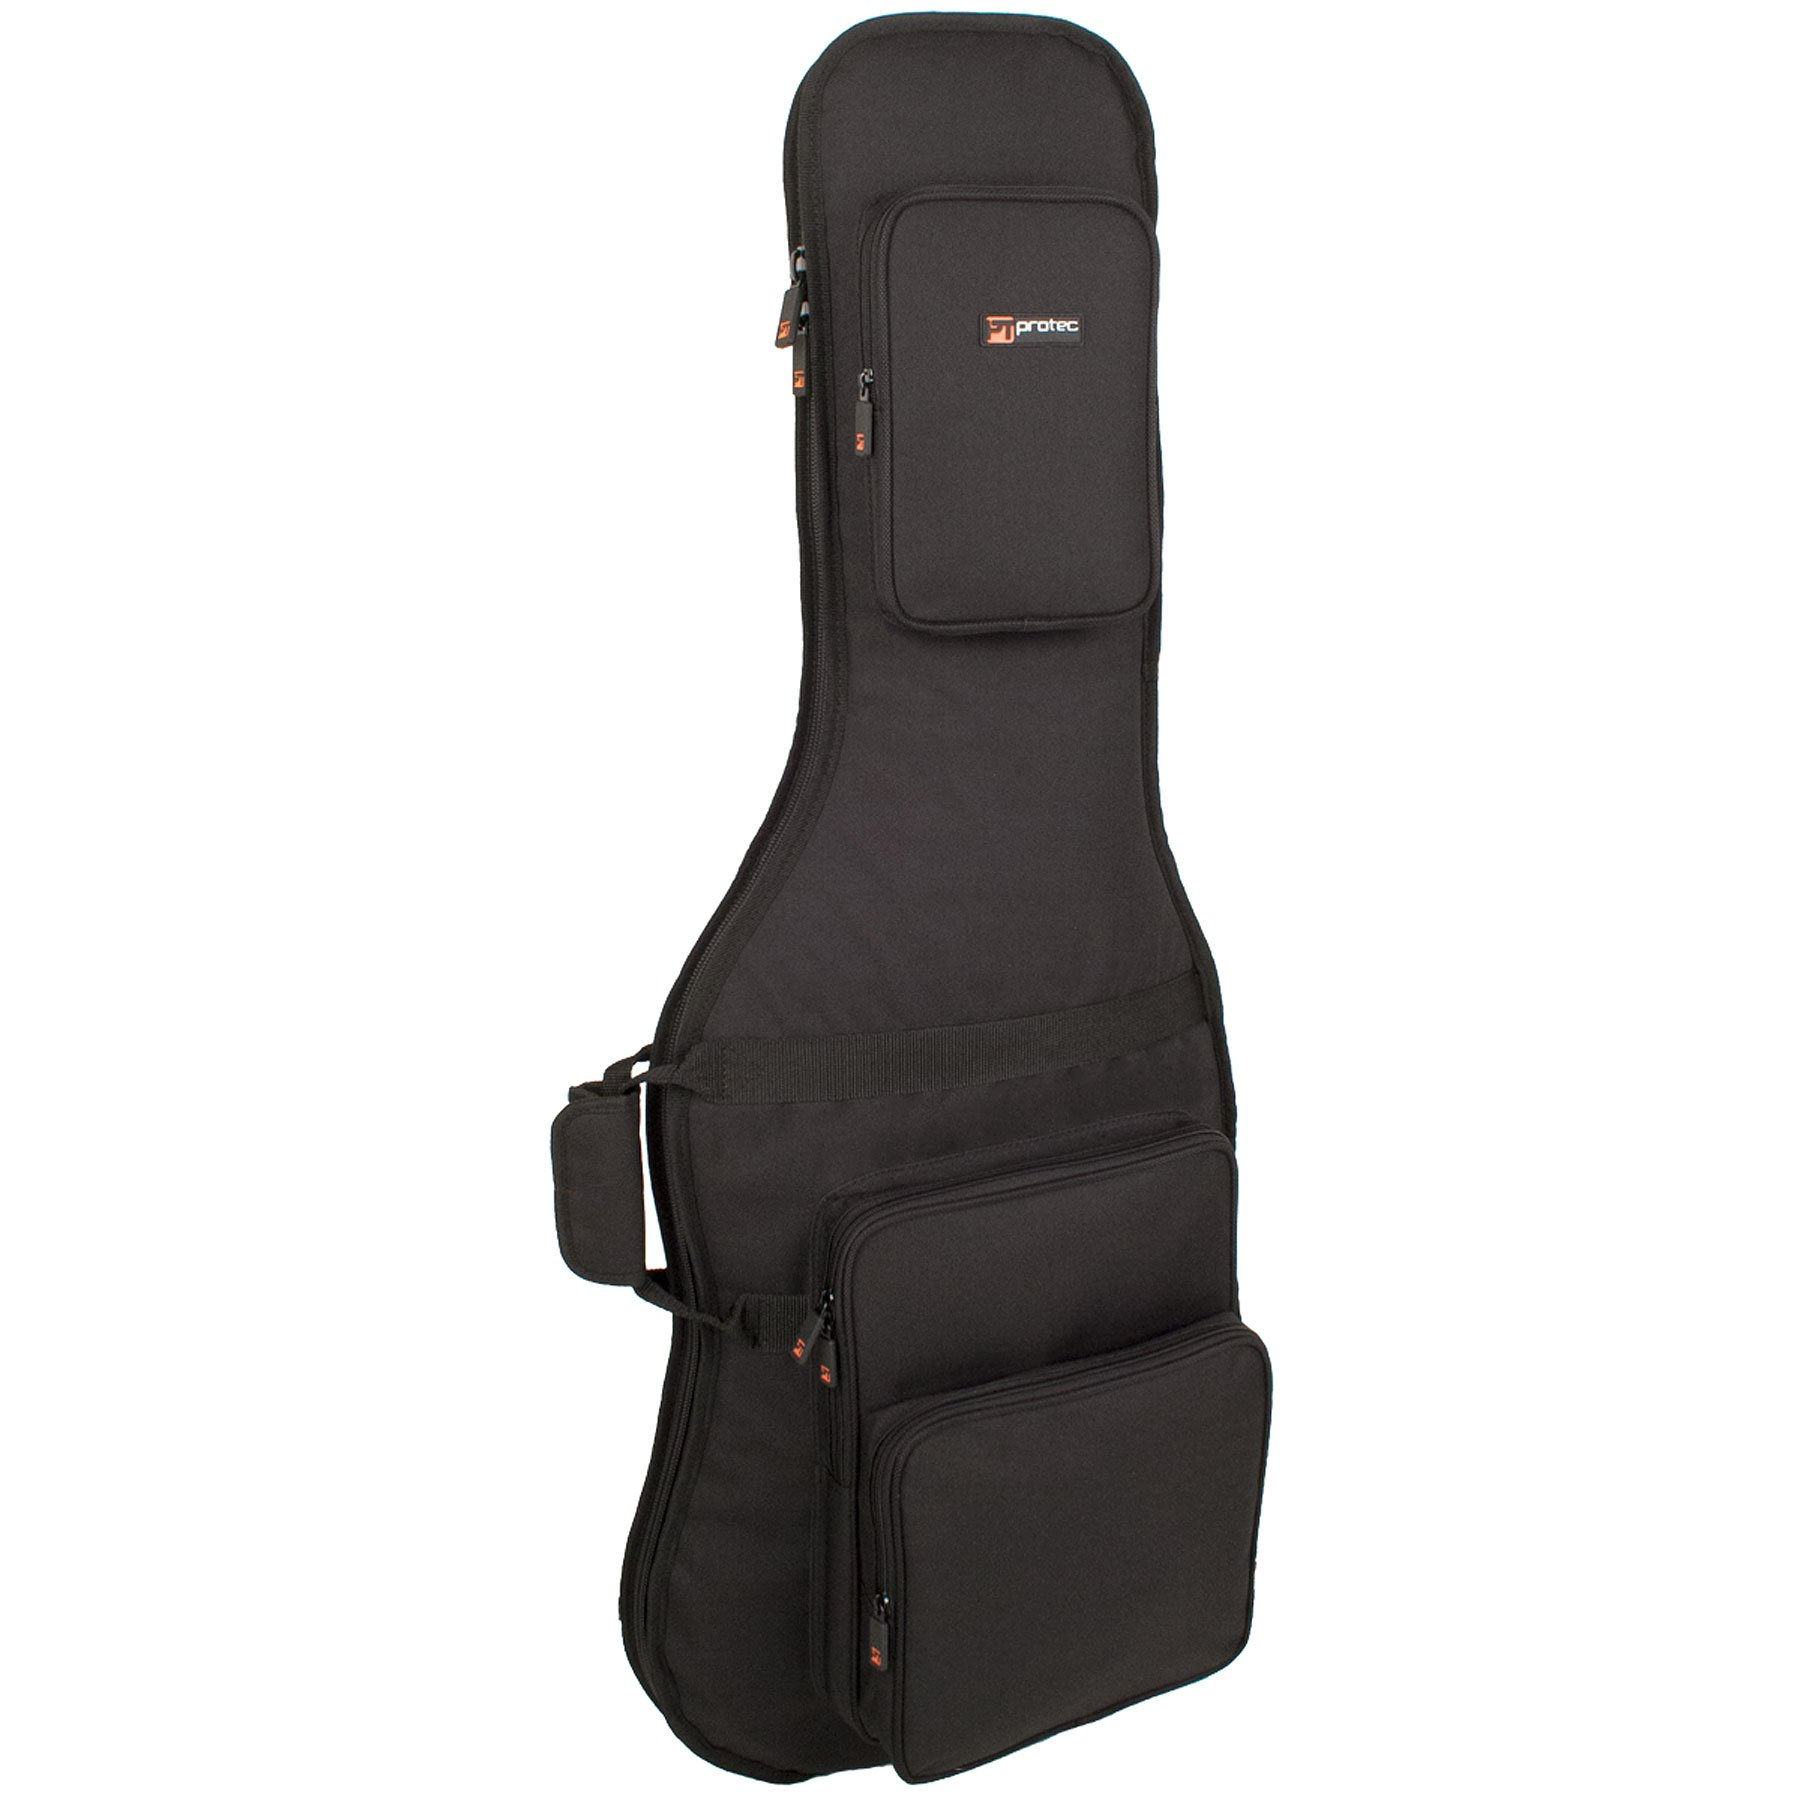 Protec CF234 Electric Guitar Gig Bag, Gold Series (Fits Strat/Tele Shaped Guitars)